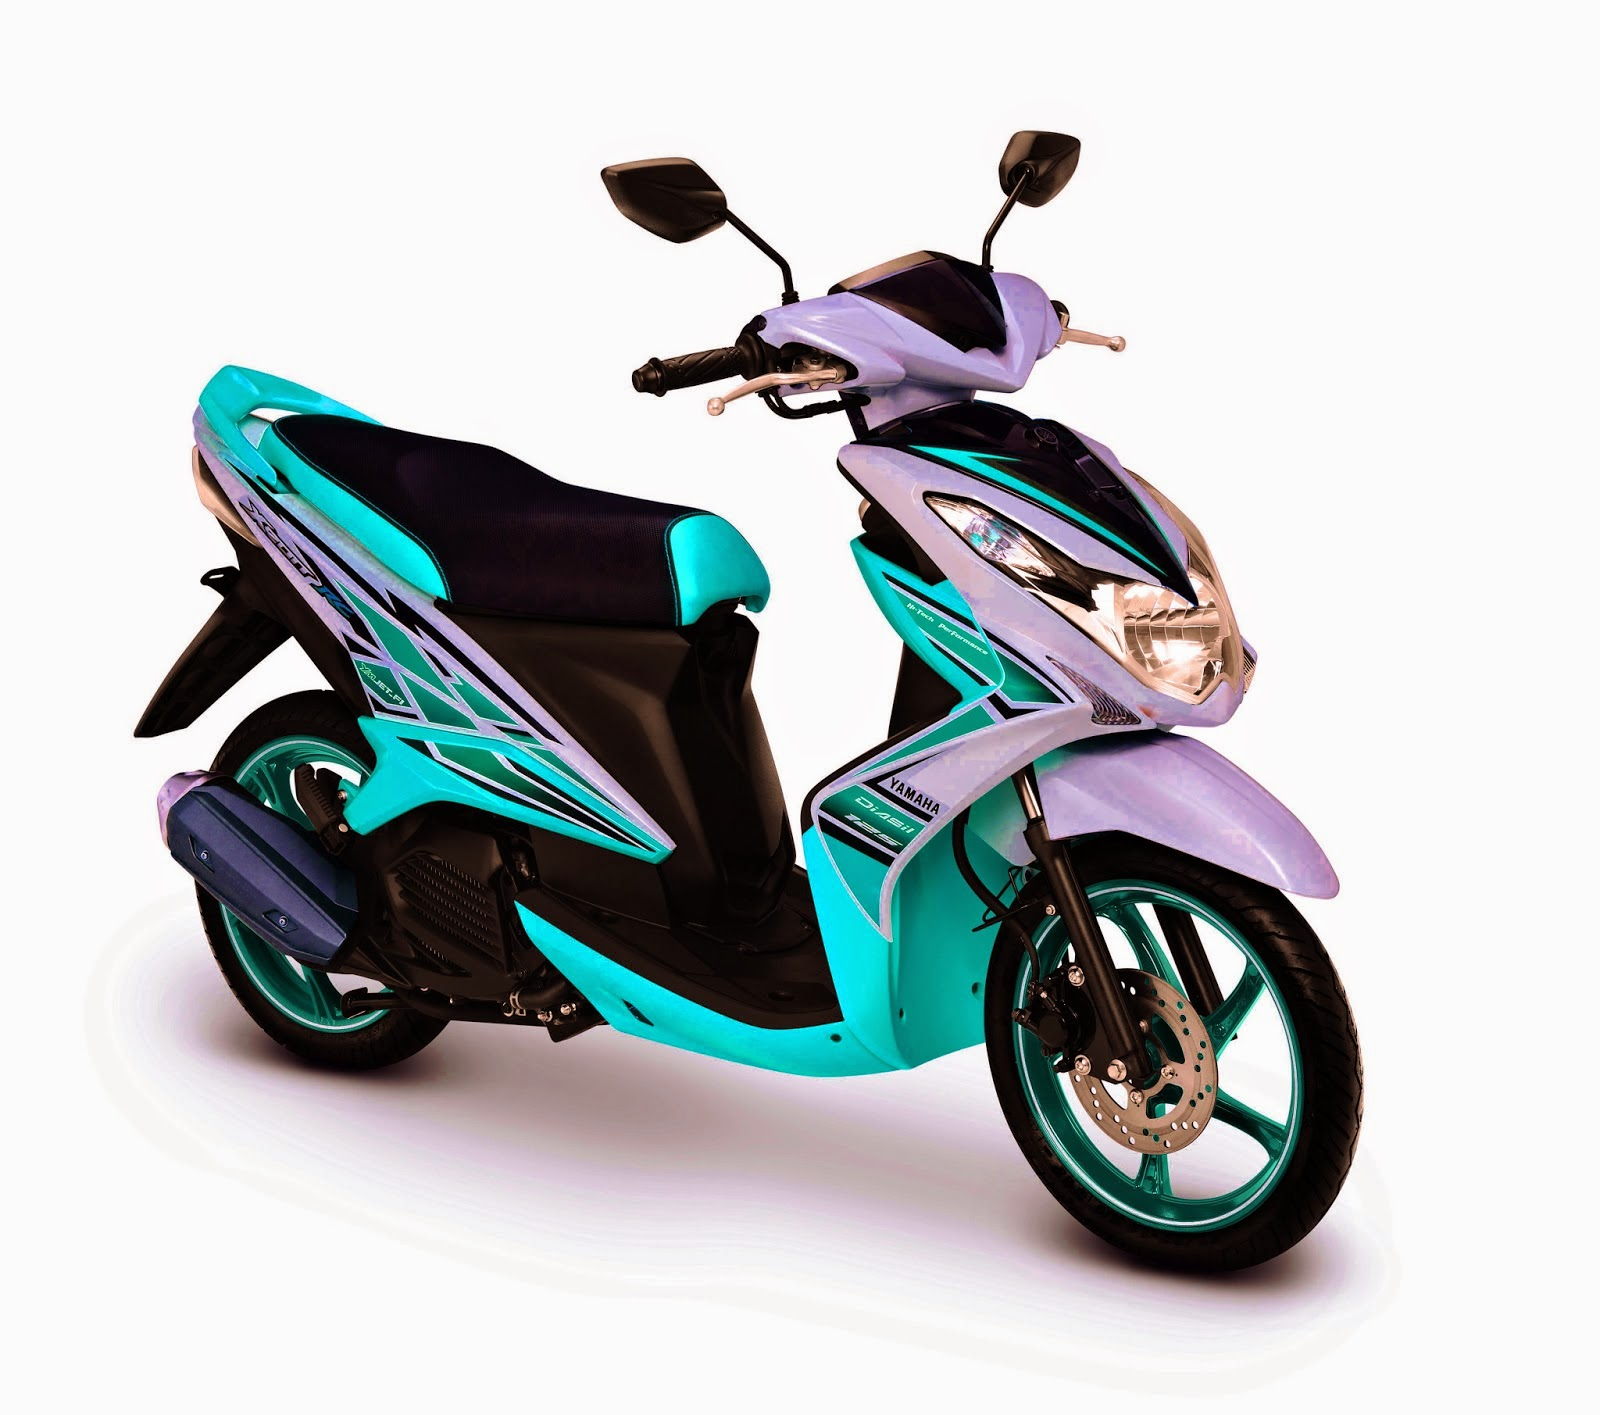 Gambar Motor Matic Yamaha Dan Harga